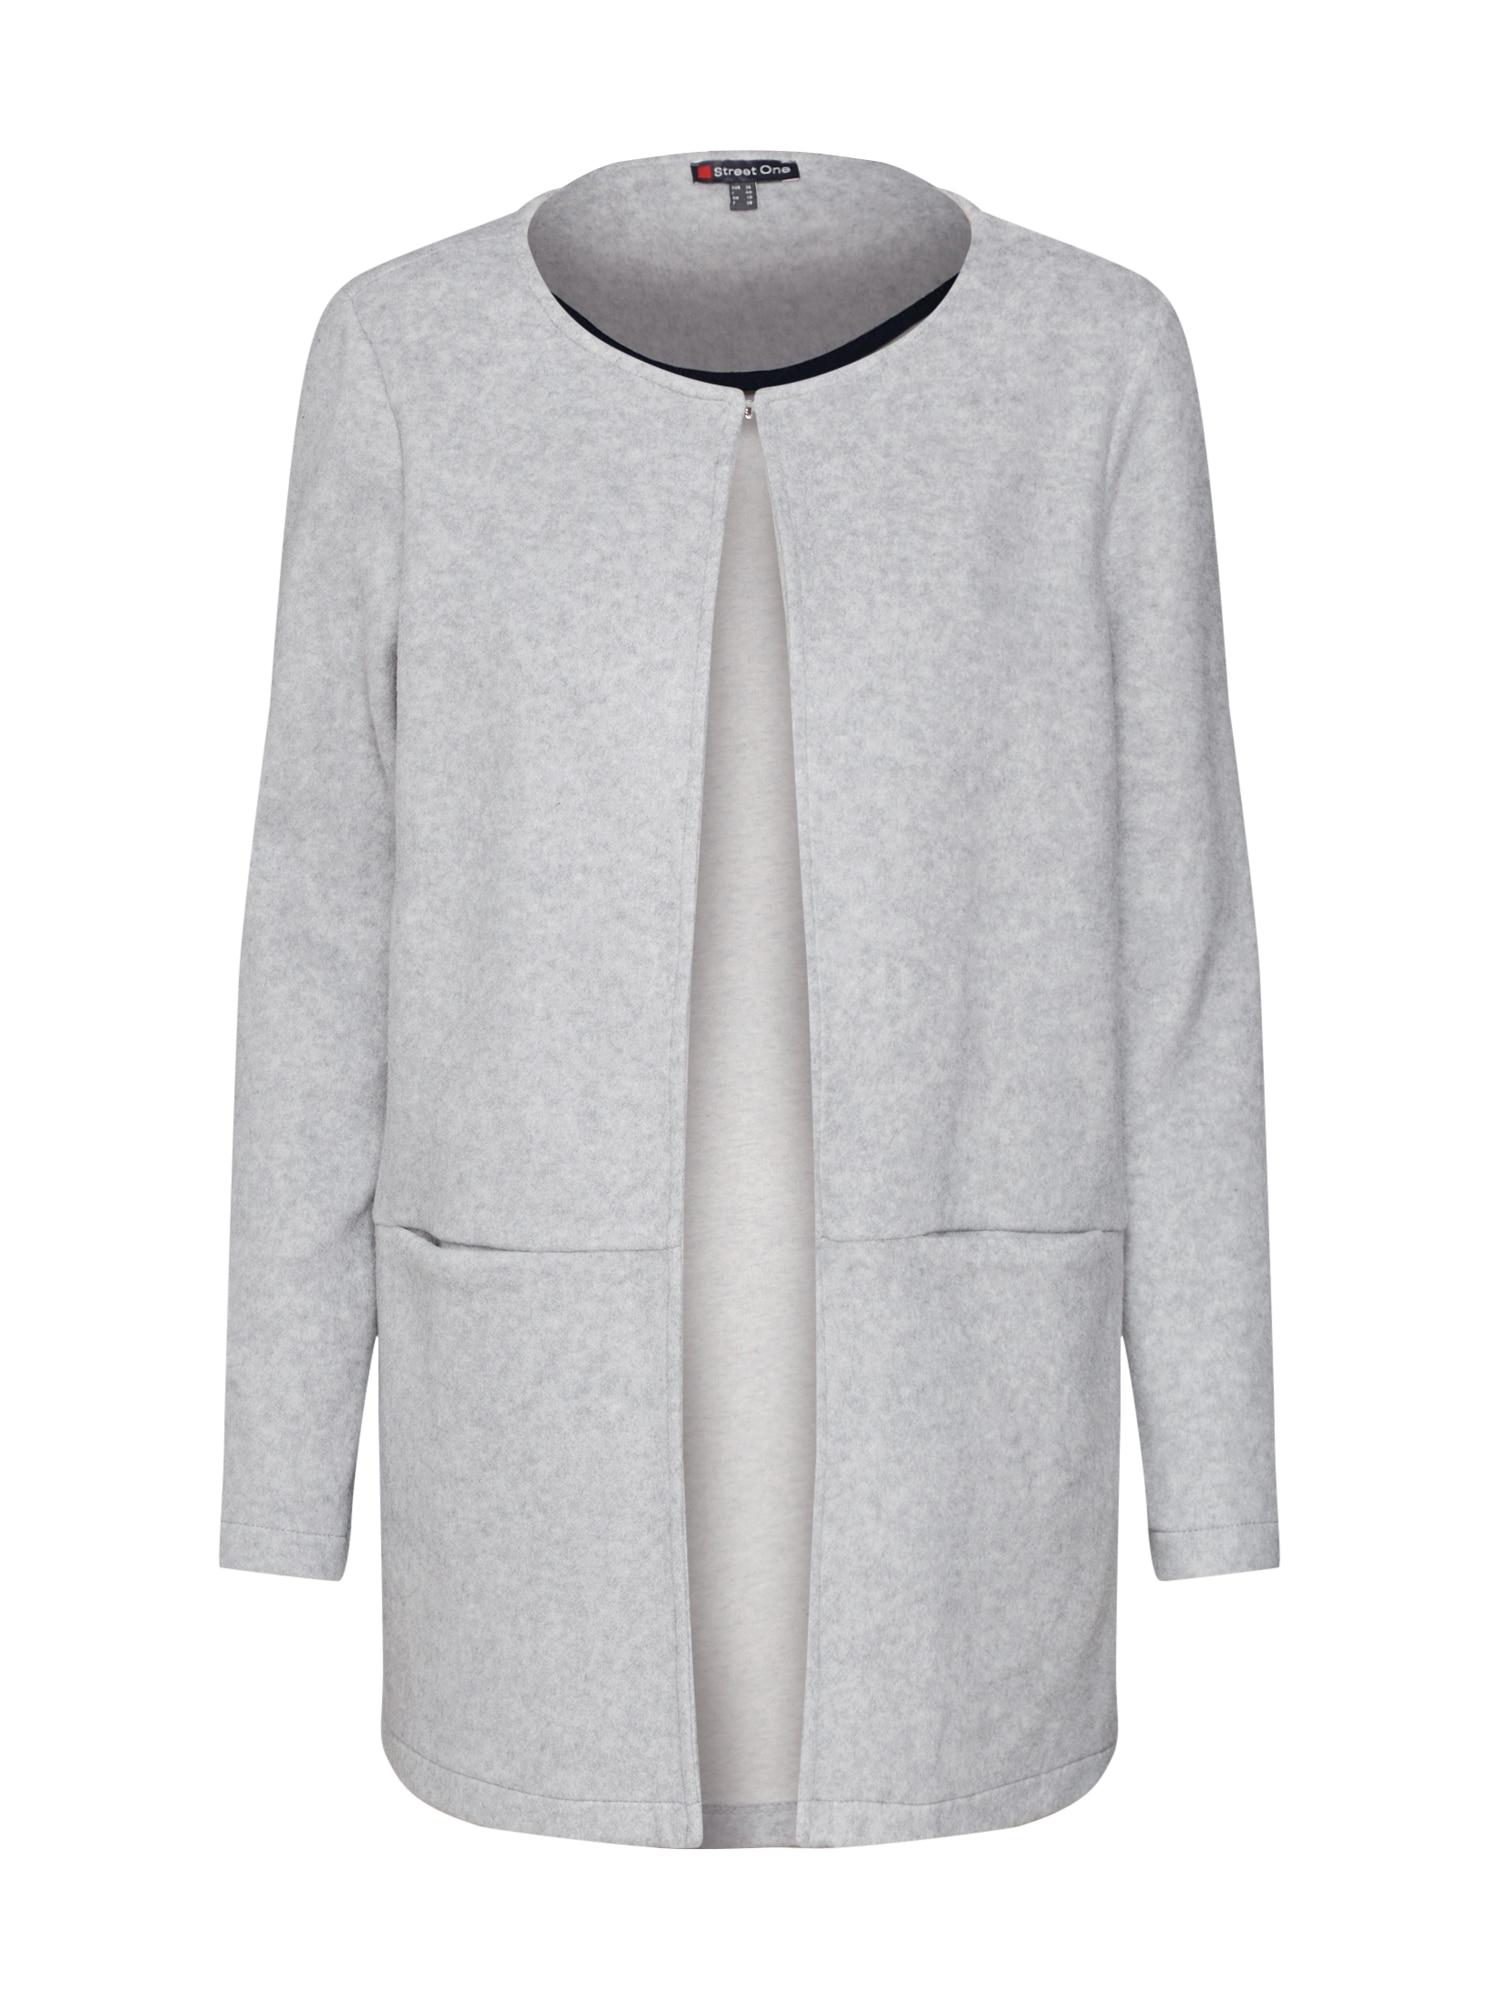 Pletený kabátek brushed longcoat šedý melír STREET ONE